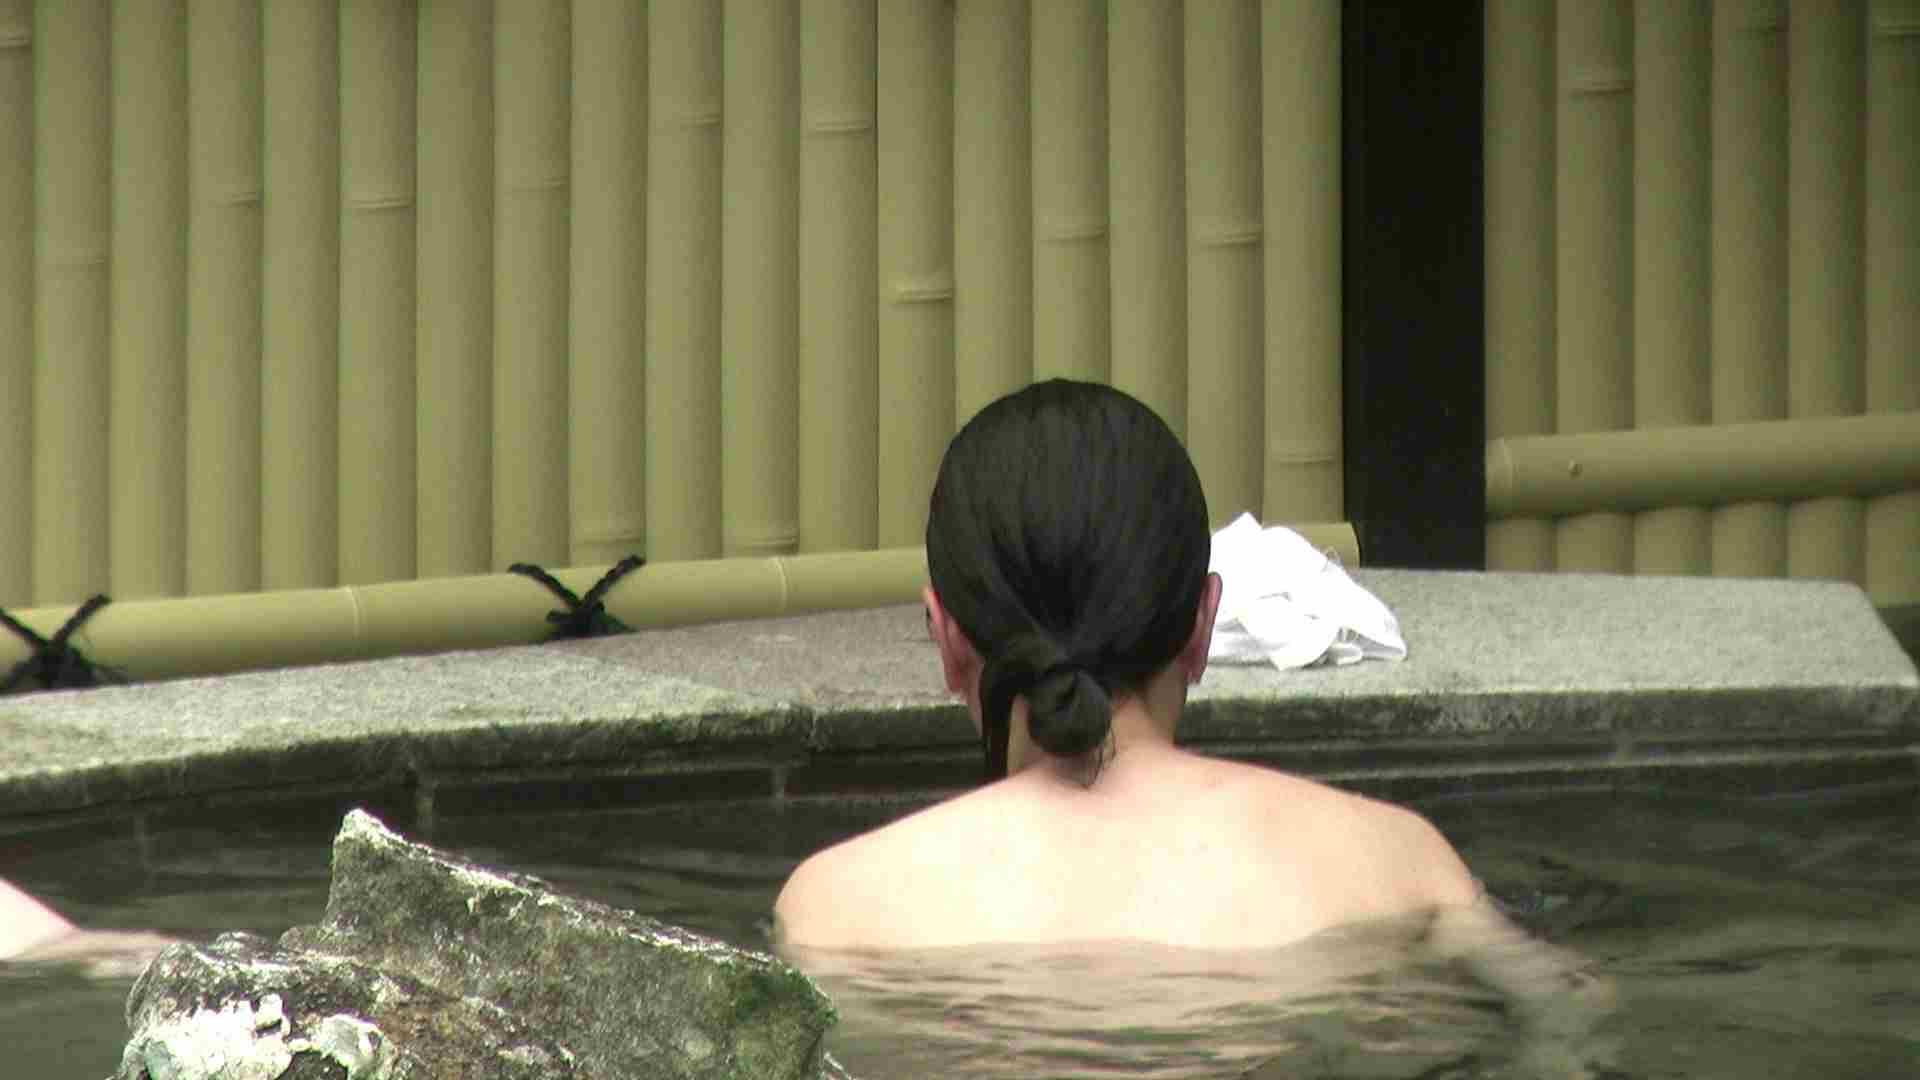 Aquaな露天風呂Vol.187 盗撮映像  99Pix 73